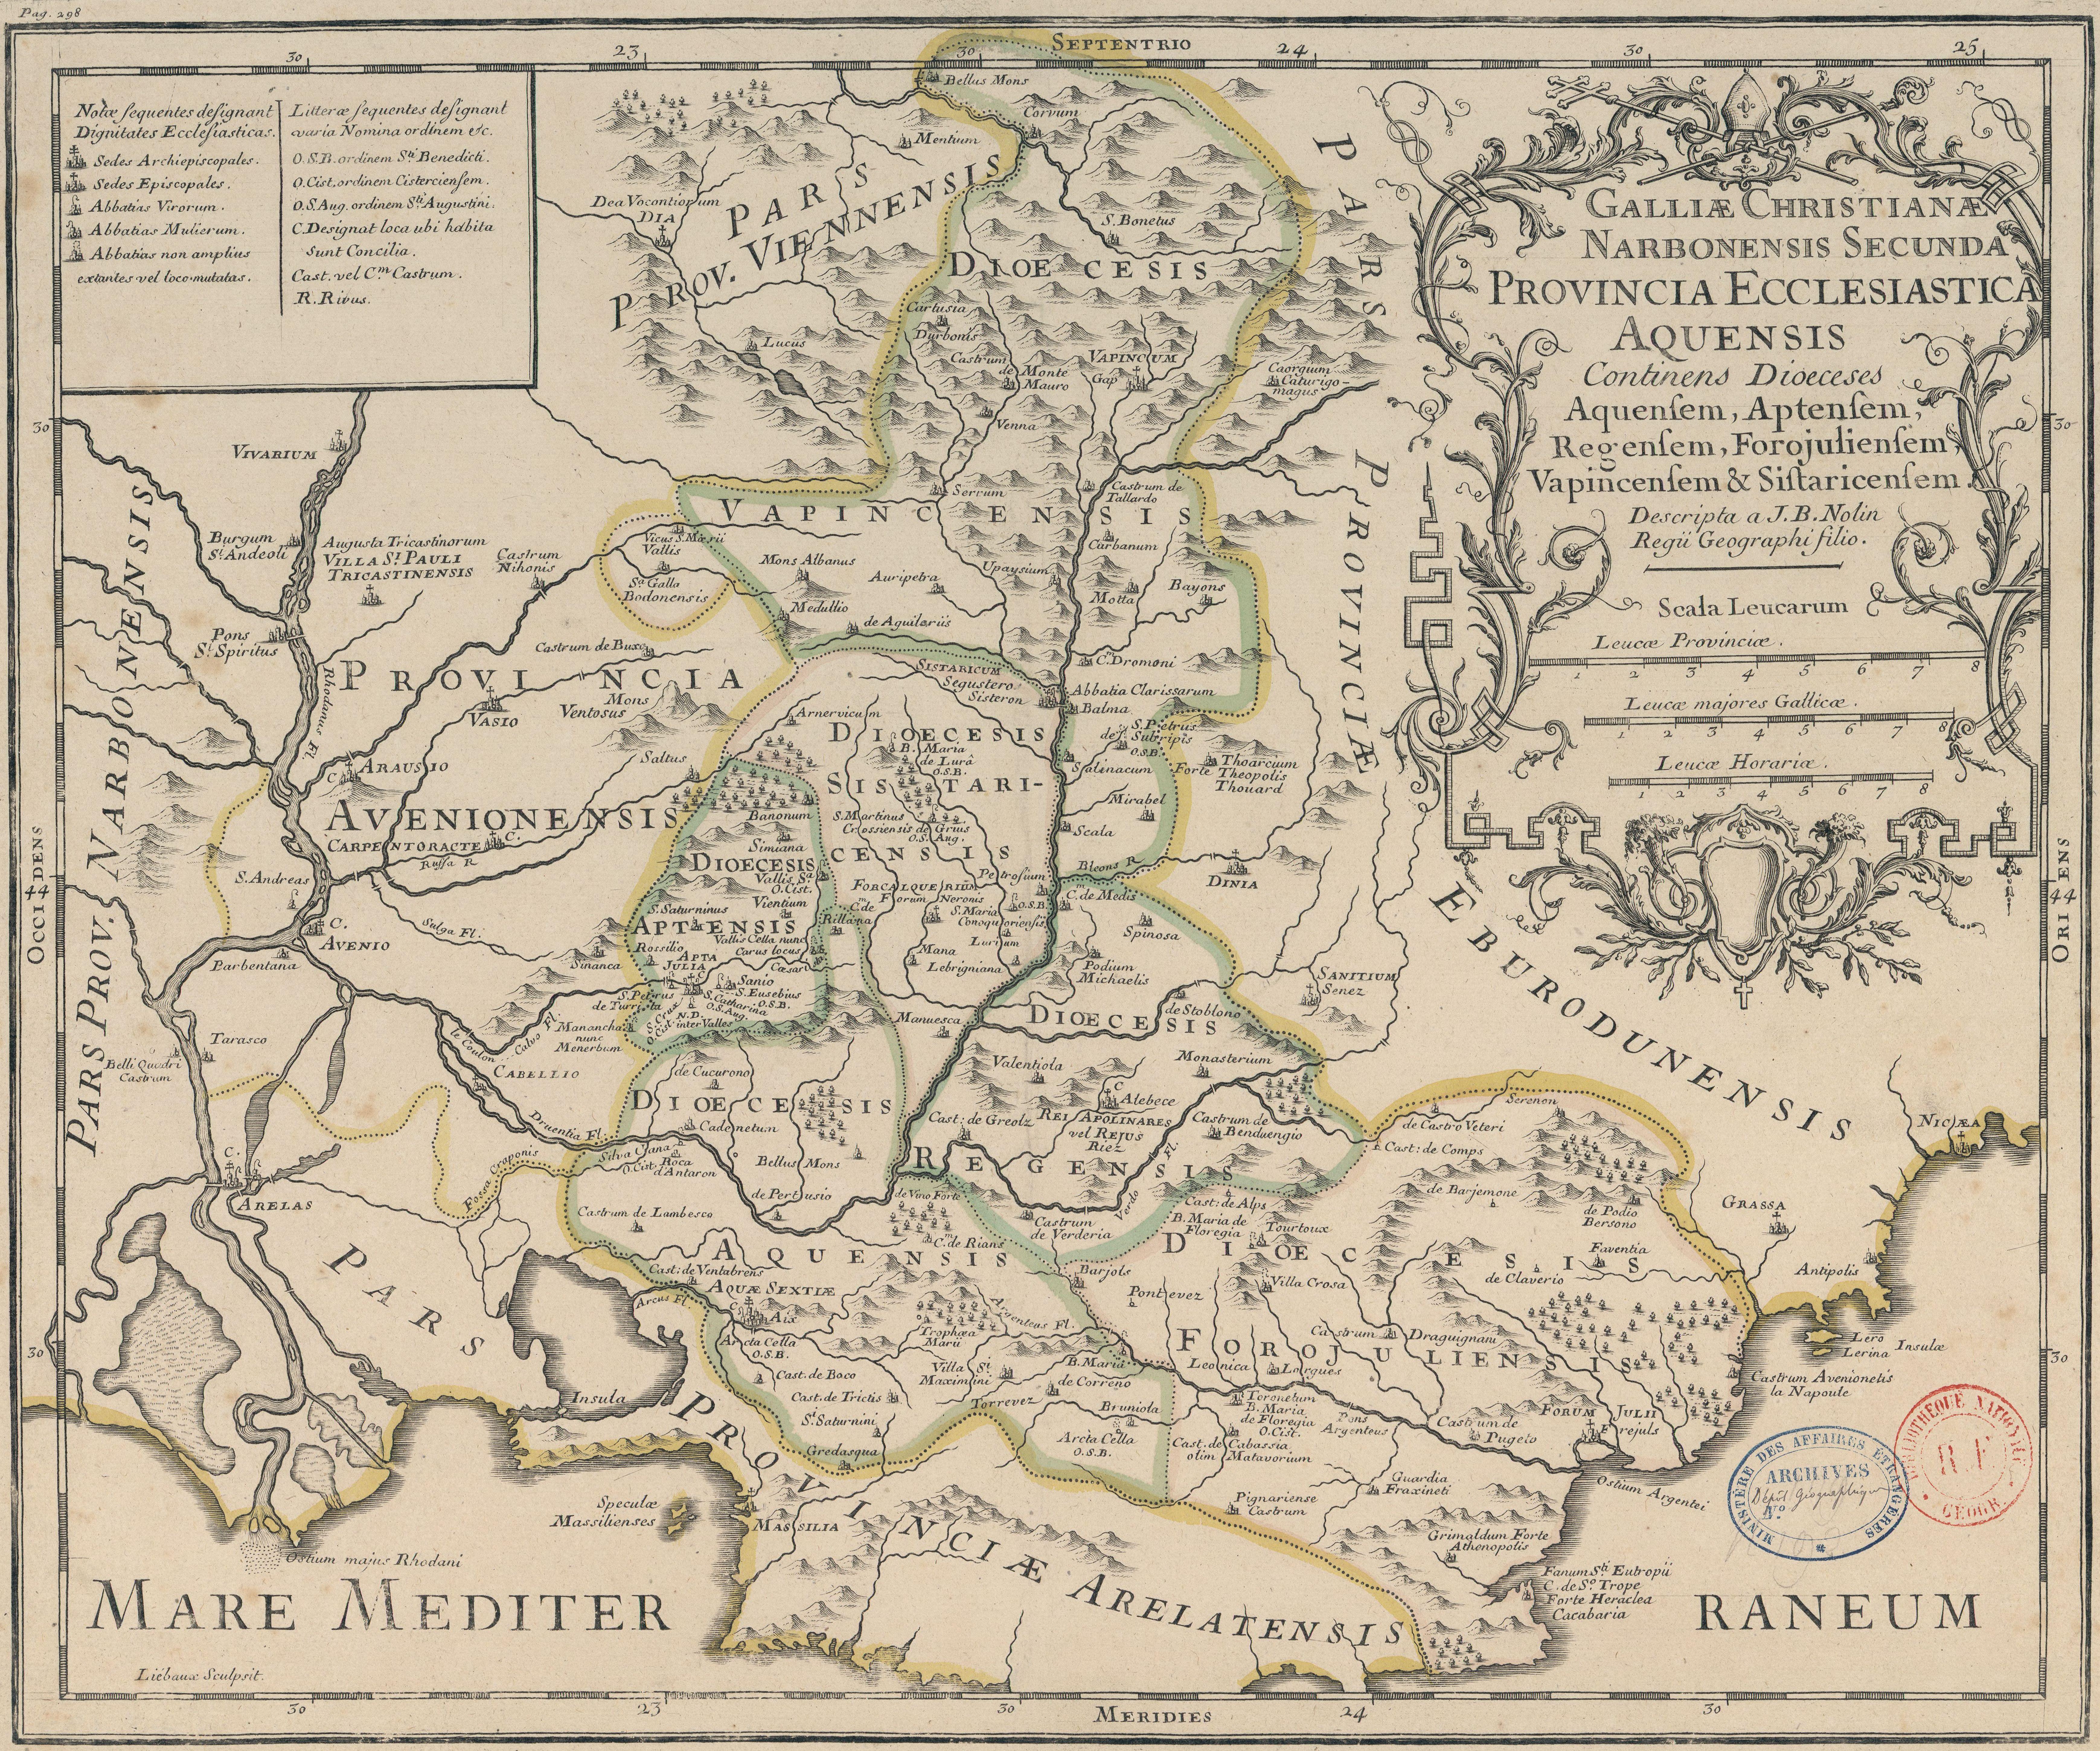 File:Gallia Christiana - Aquensis - 1715.jpg